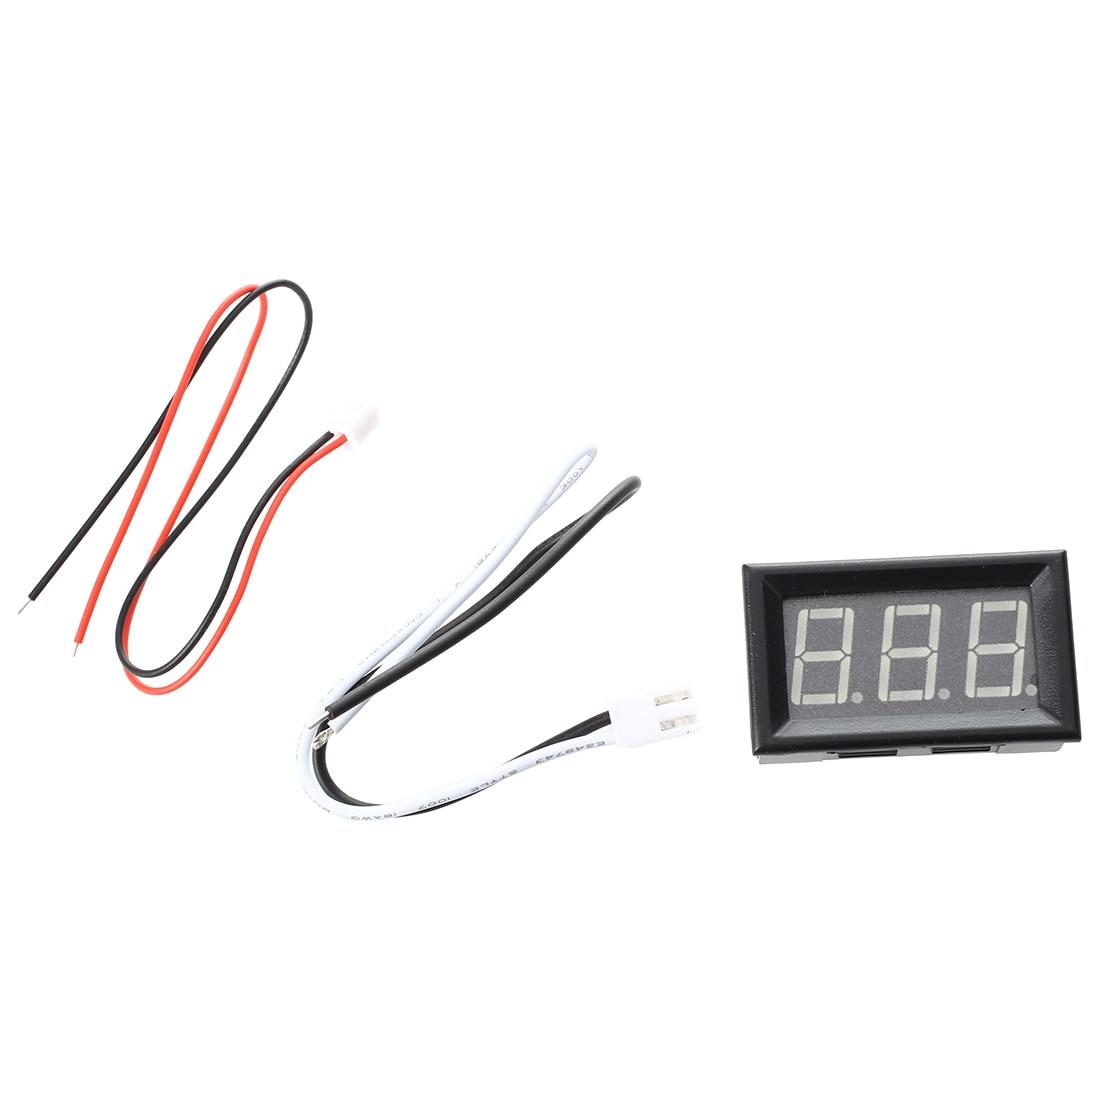 Digital <font><b>LED</b></font> Ampere Meter <font><b>AMP</b></font> Panel Meter Ammeter DC 0 &#8211; 10A Gelb Neu